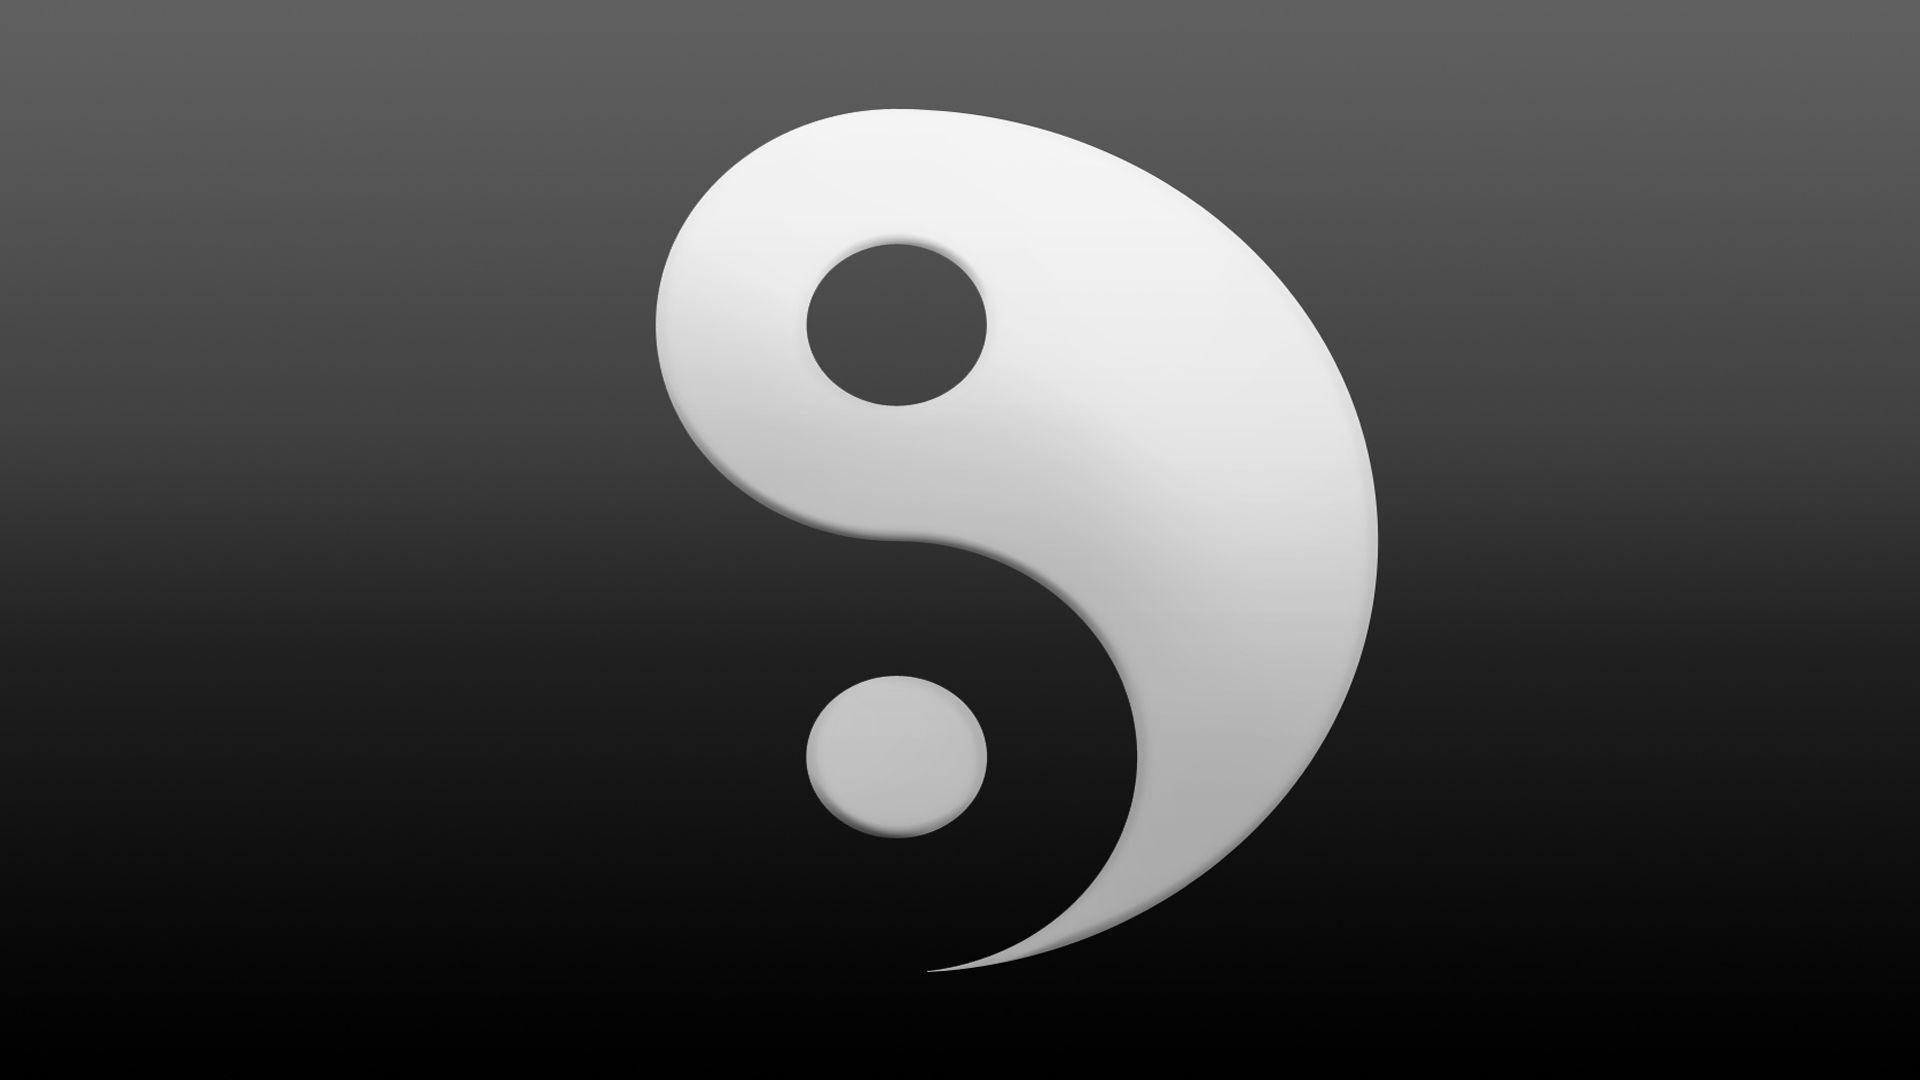 Yin Yang Dragon Wallpaper 49 Images